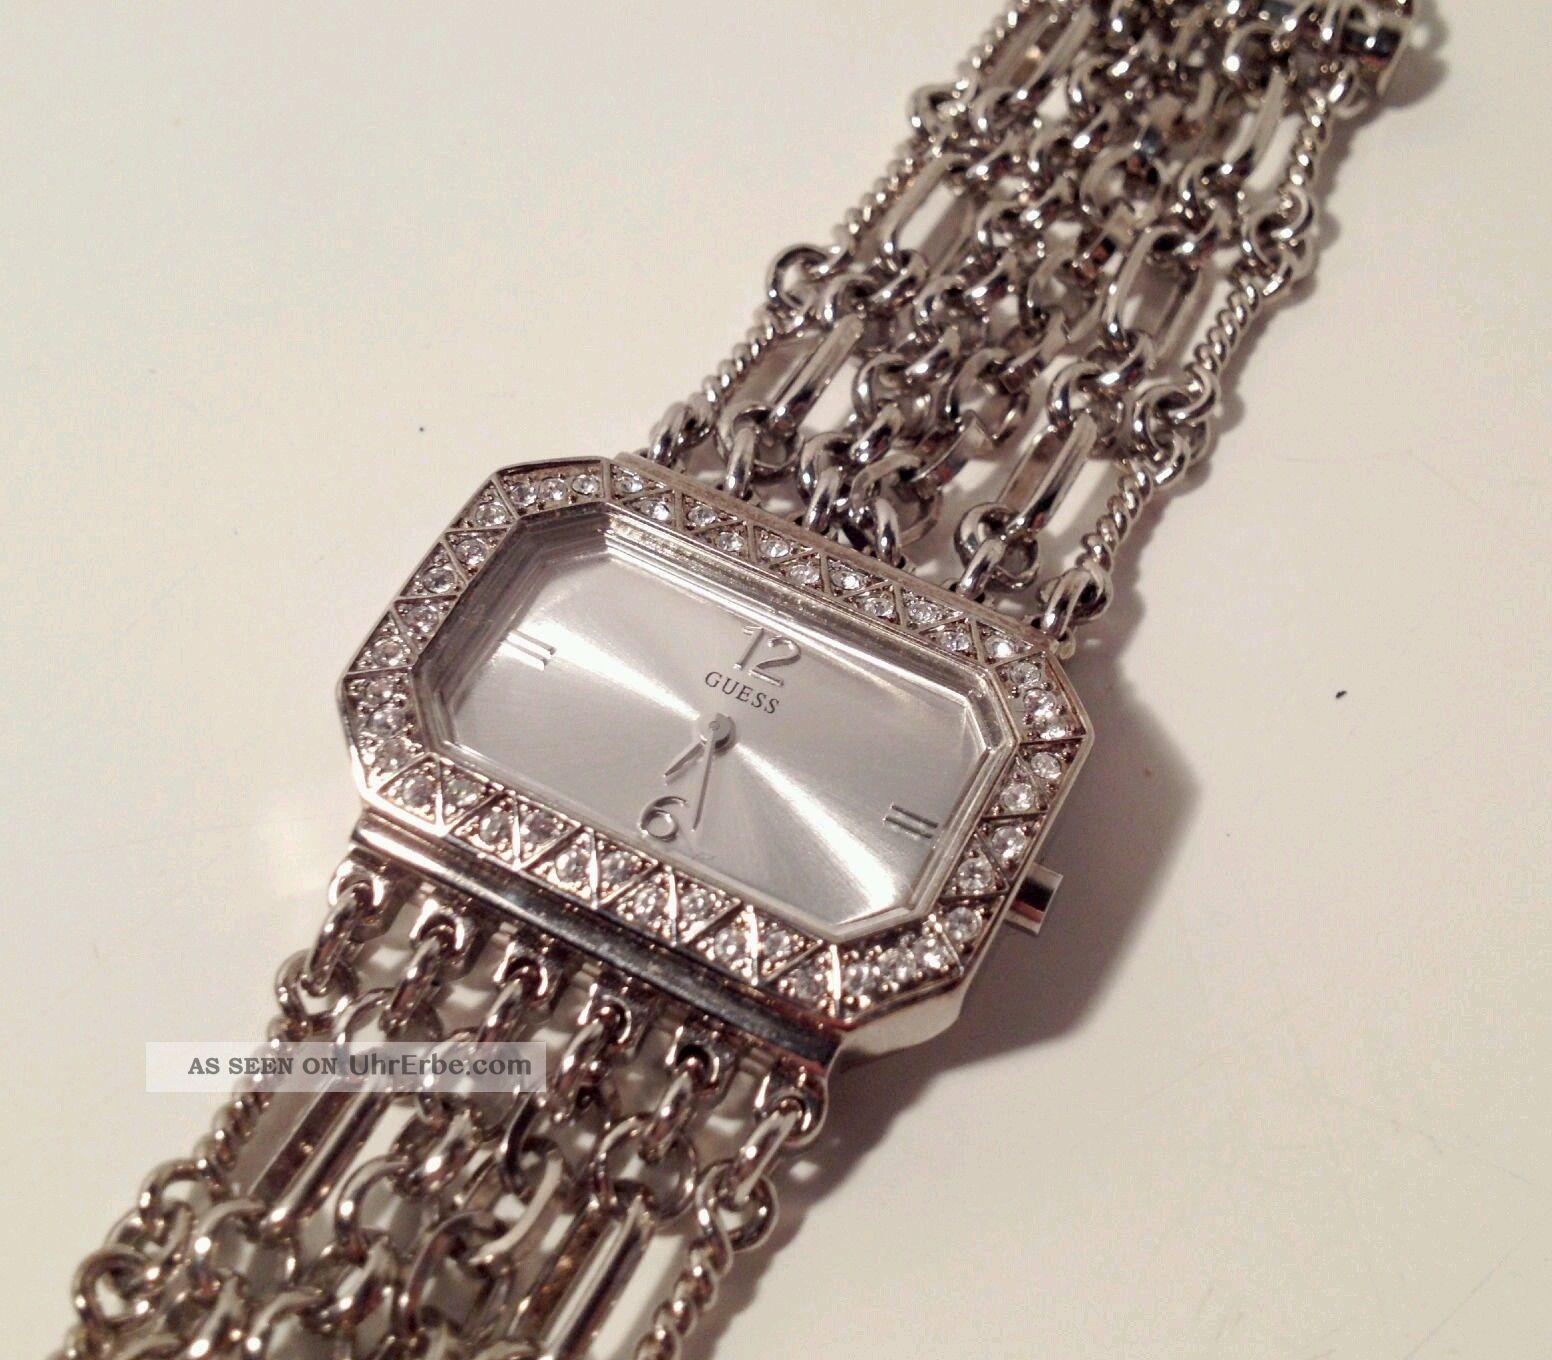 Guess Damen Armband Uhr Kettenuhr Strass Nur 1 Tag Armbanduhren Bild